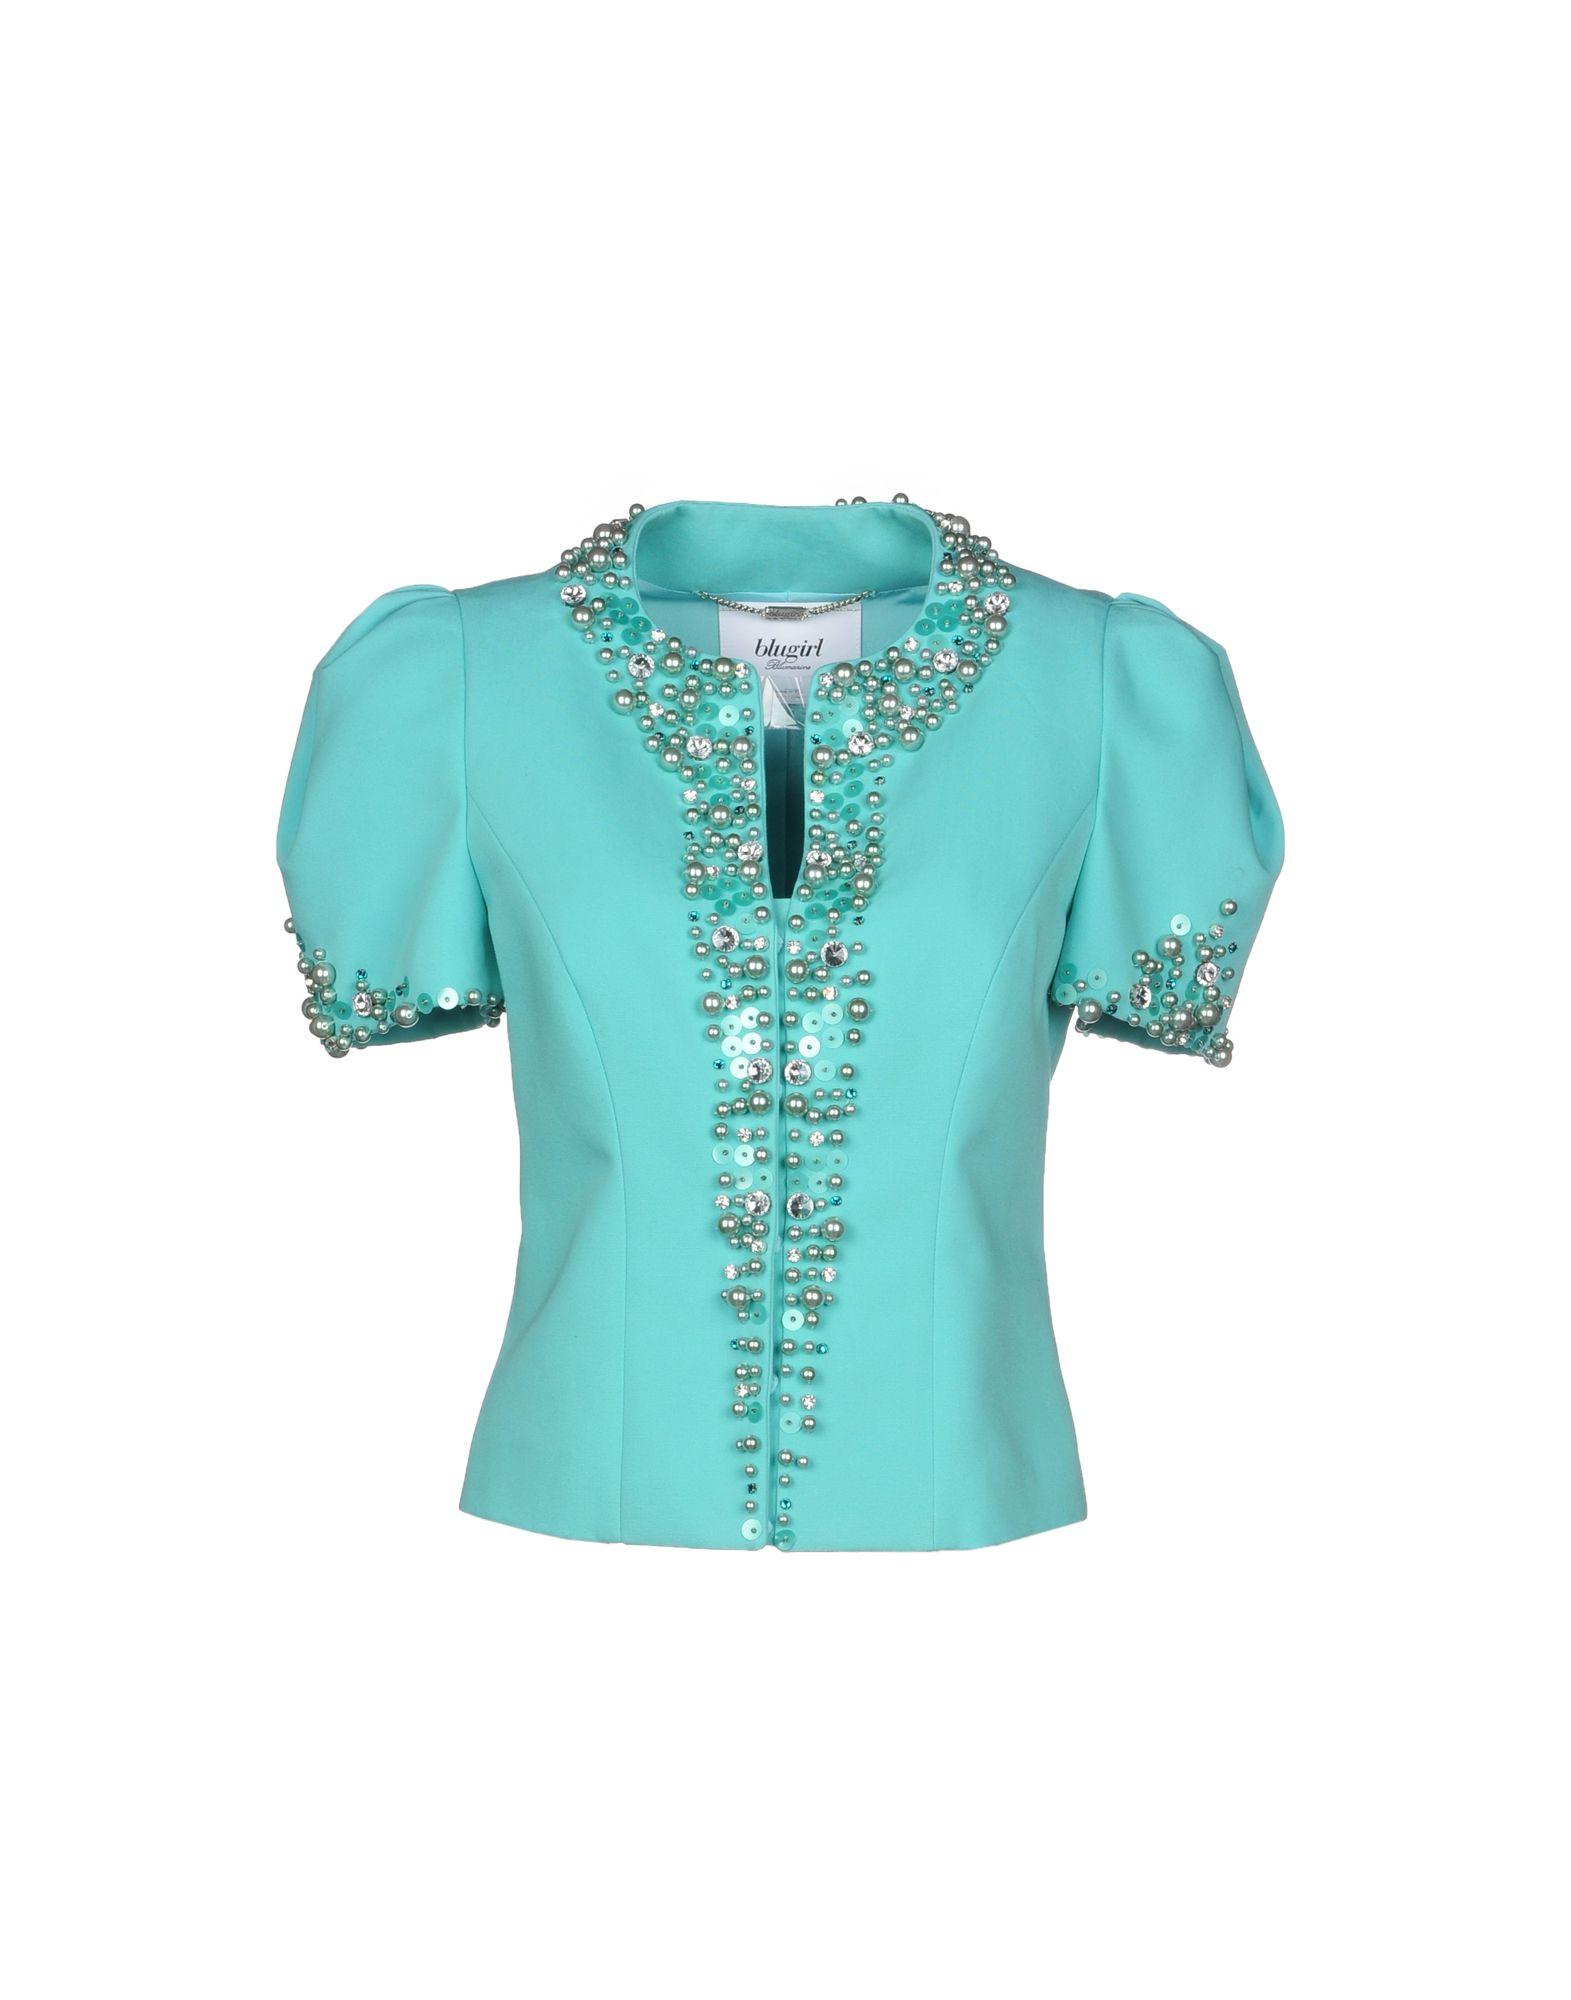 BLUGIRL BLUMARINE Пиджак blugirl blumarine пиджак